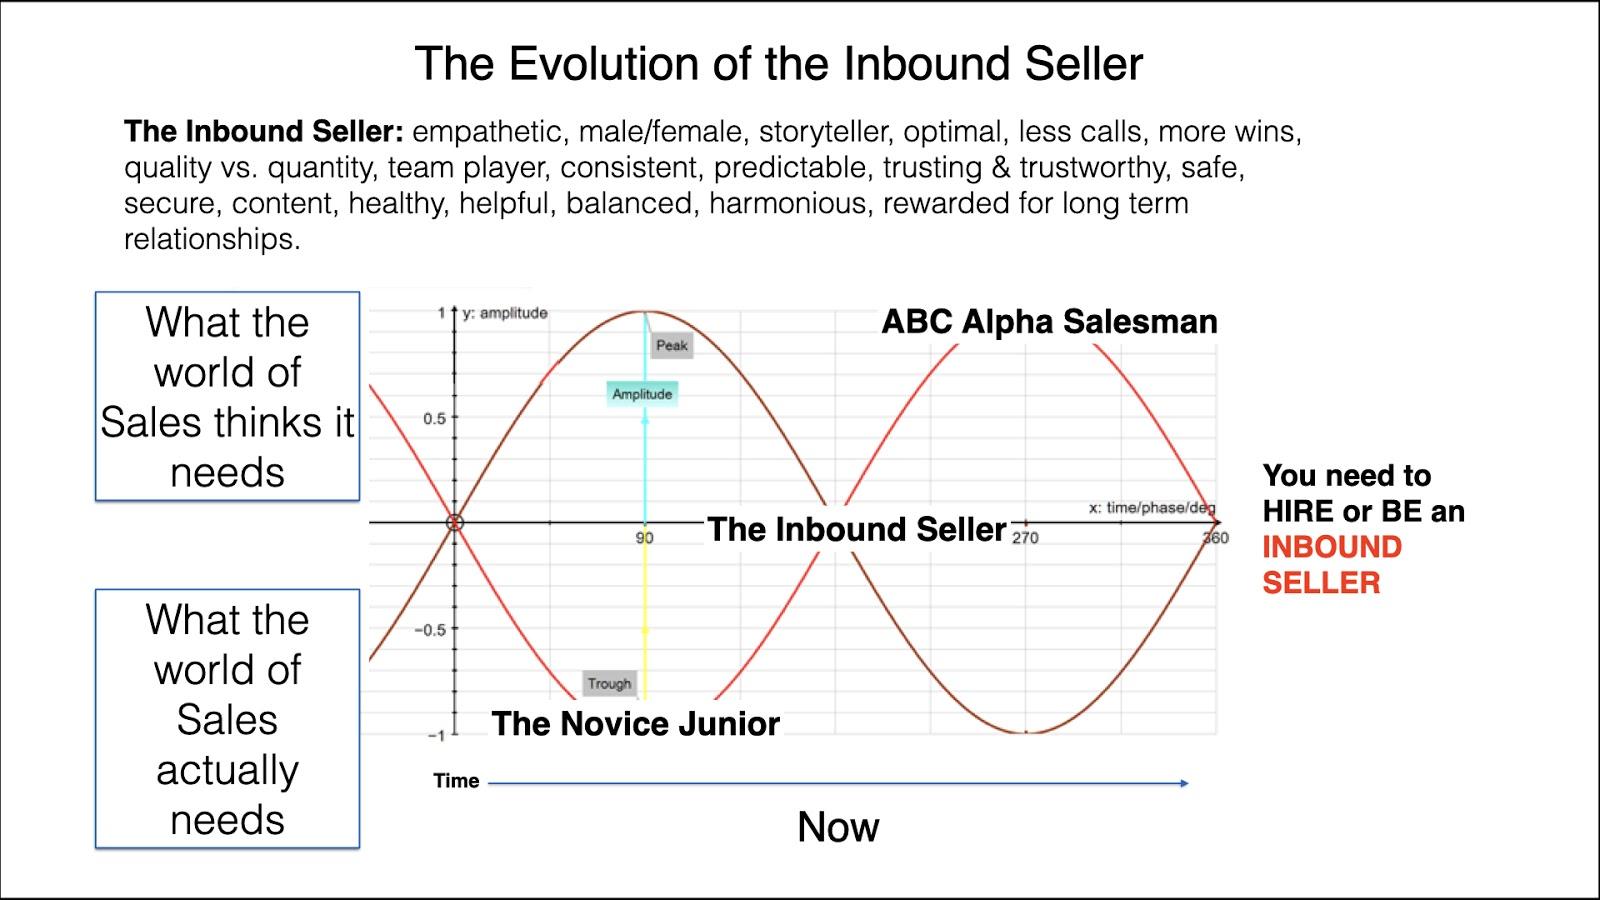 The Evolution of the Inbound Seller